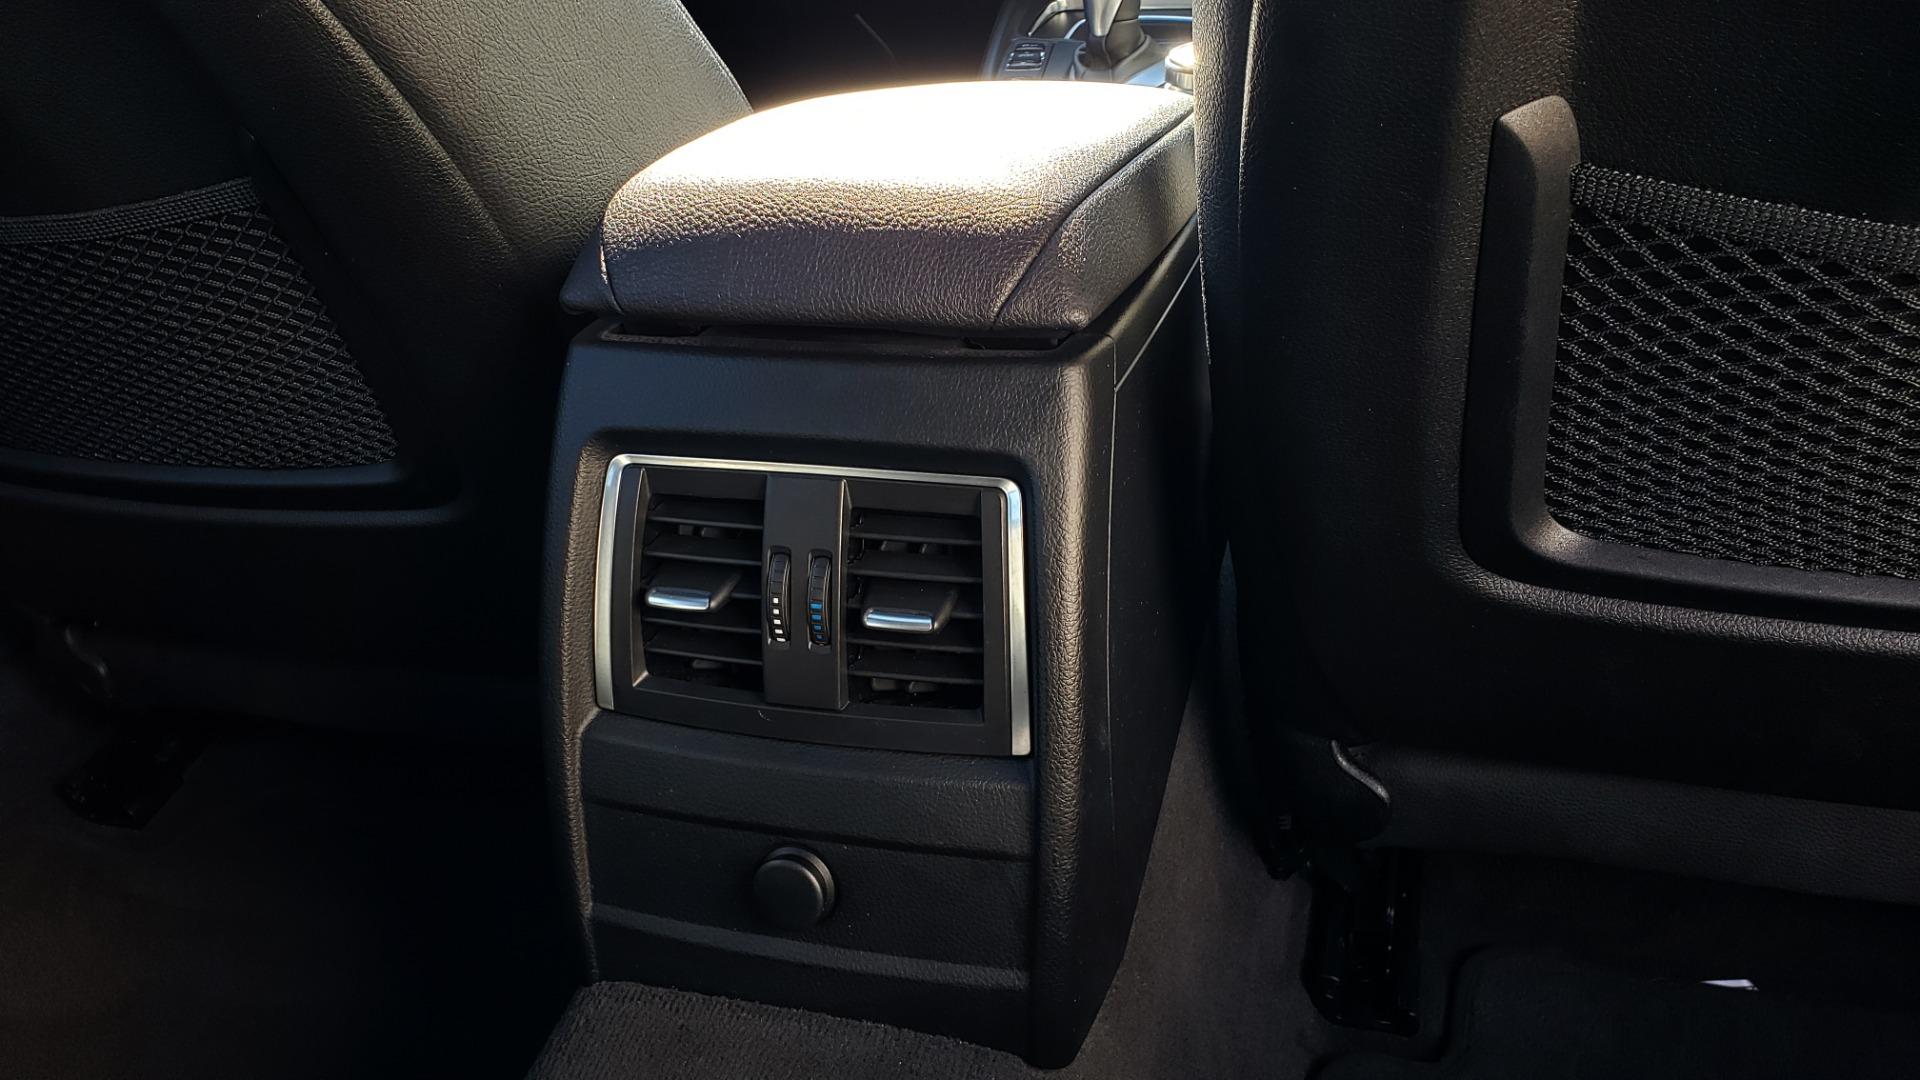 Used 2018 BMW 4 SERIES 430IXDRIVE / PREMIUM / NAV / SUNROOF / ESSENTIALS PKG for sale $27,795 at Formula Imports in Charlotte NC 28227 80